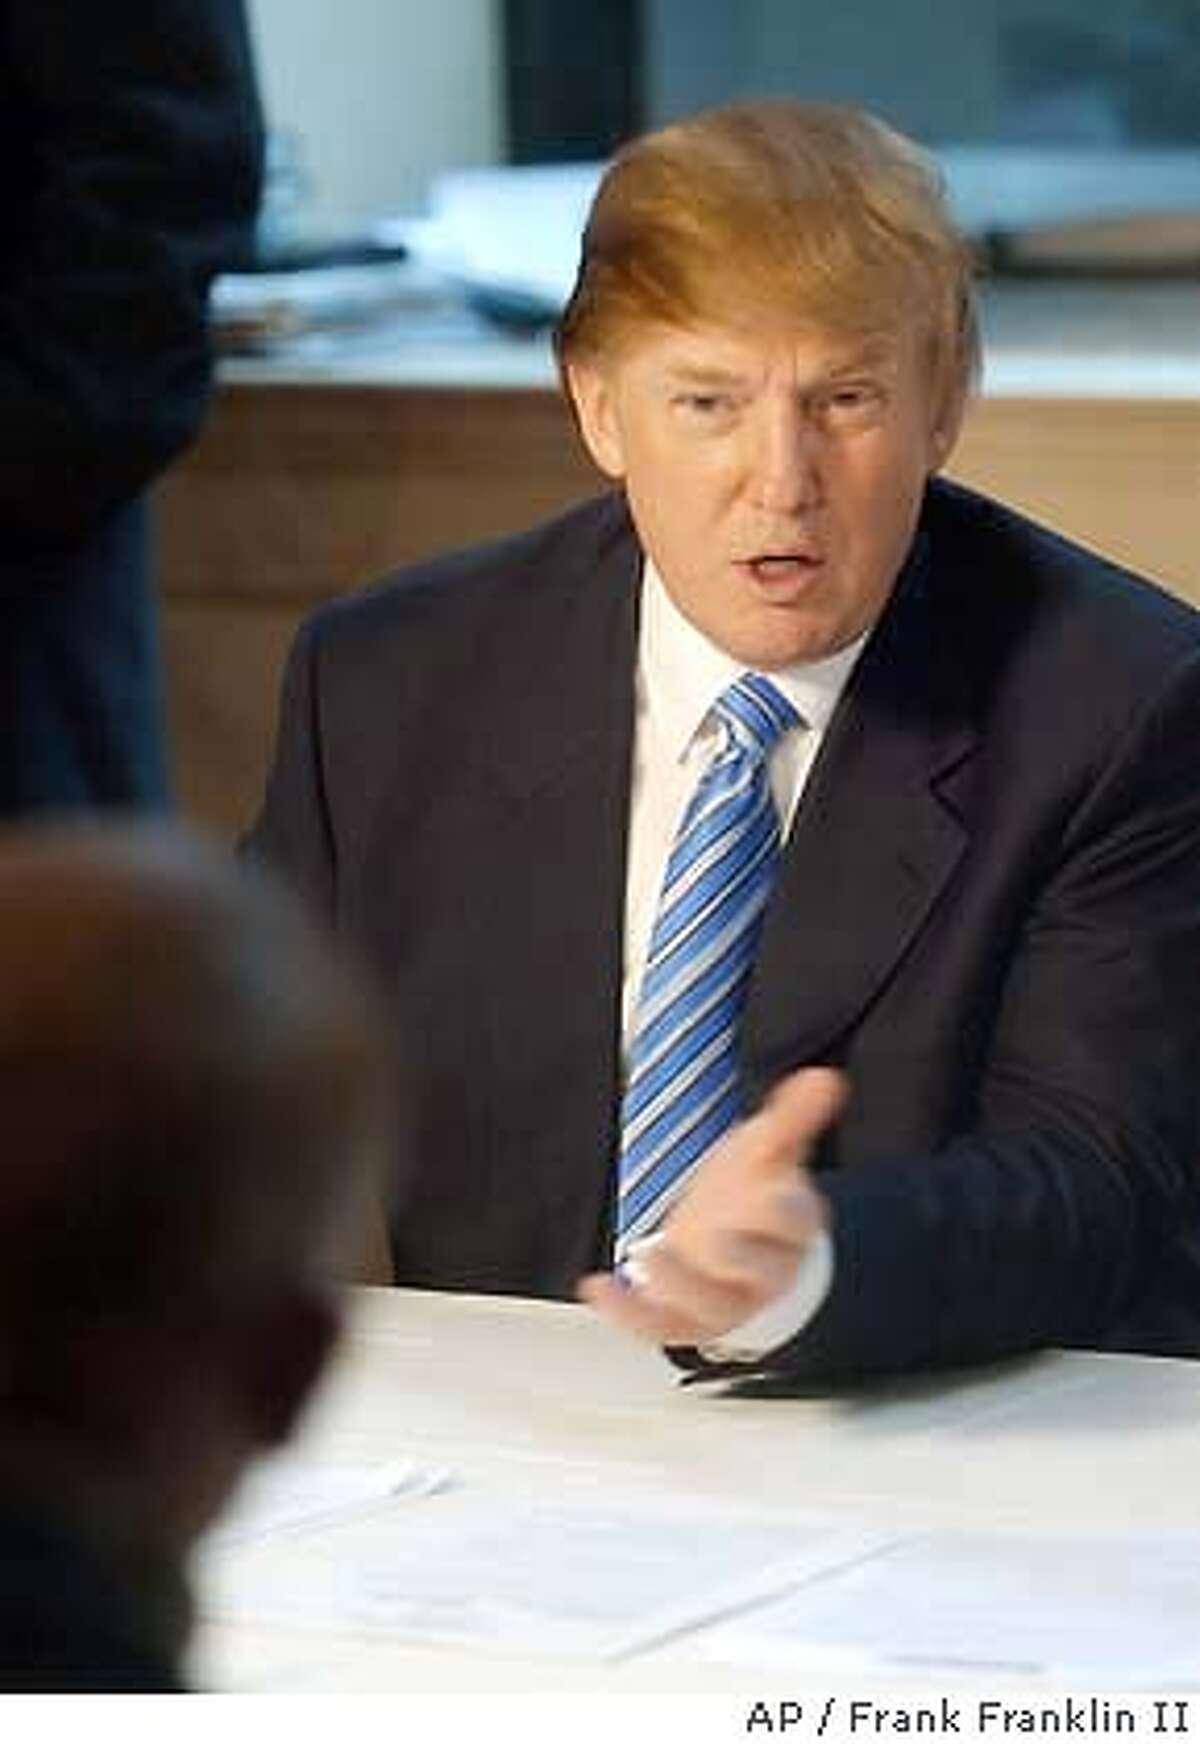 Billionaire developer Donald Trump, right, addresses a casting call for the second season of his televison show,